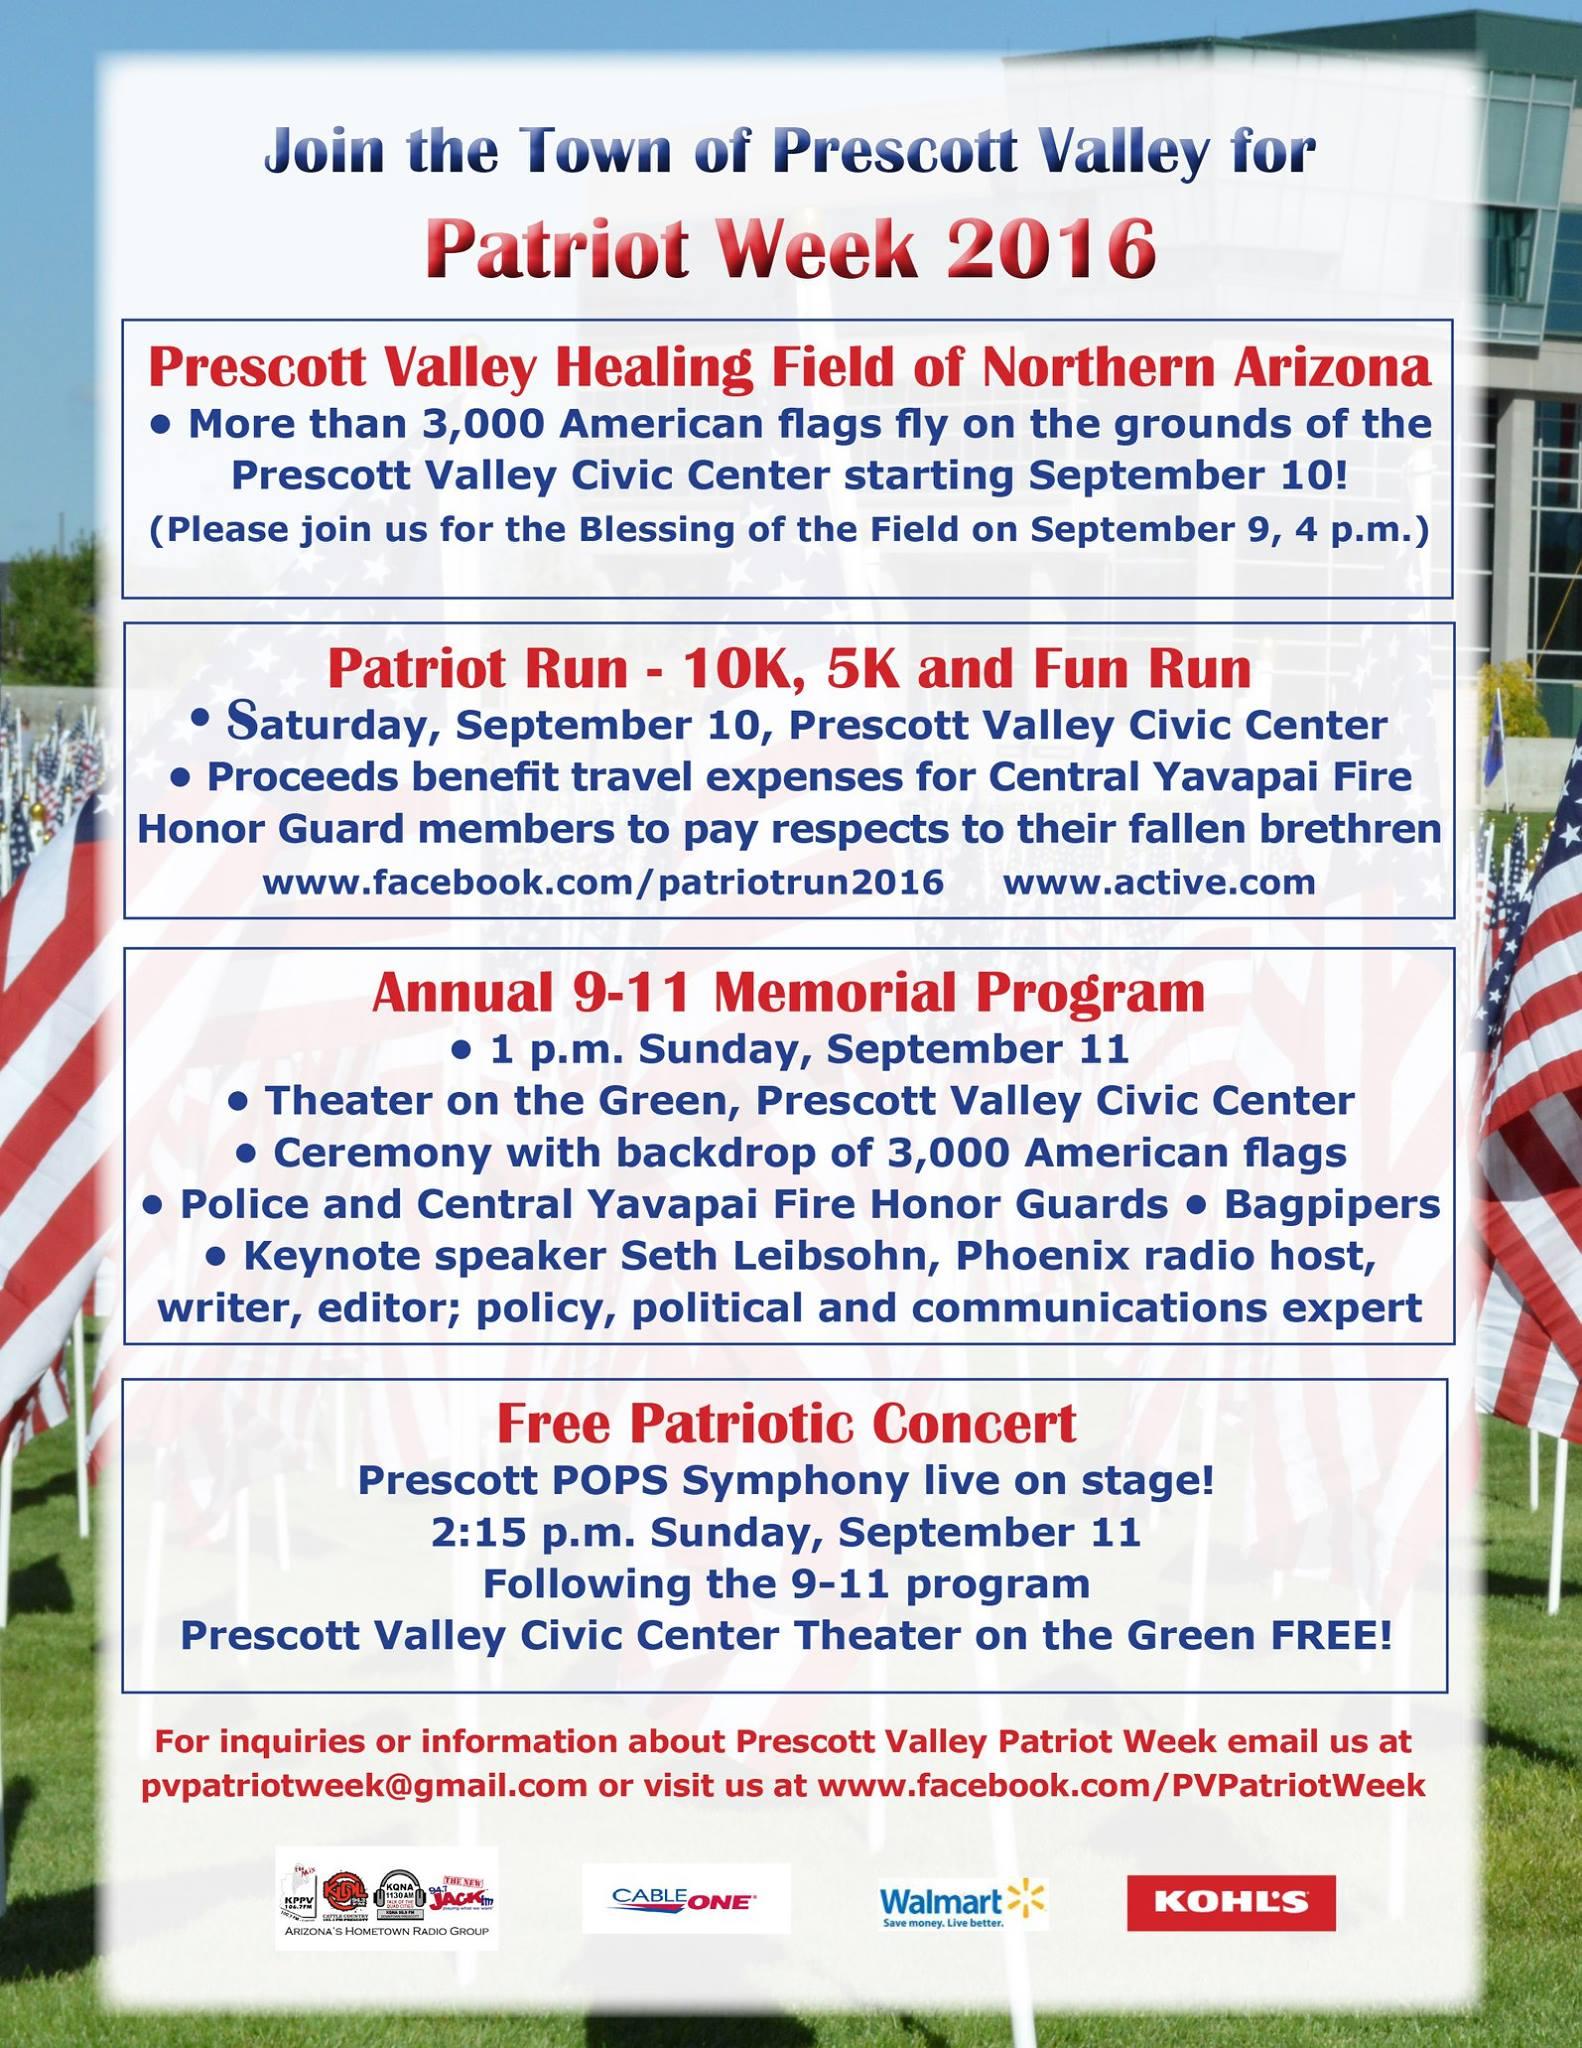 Patriot Week 2016 Prescott Valley